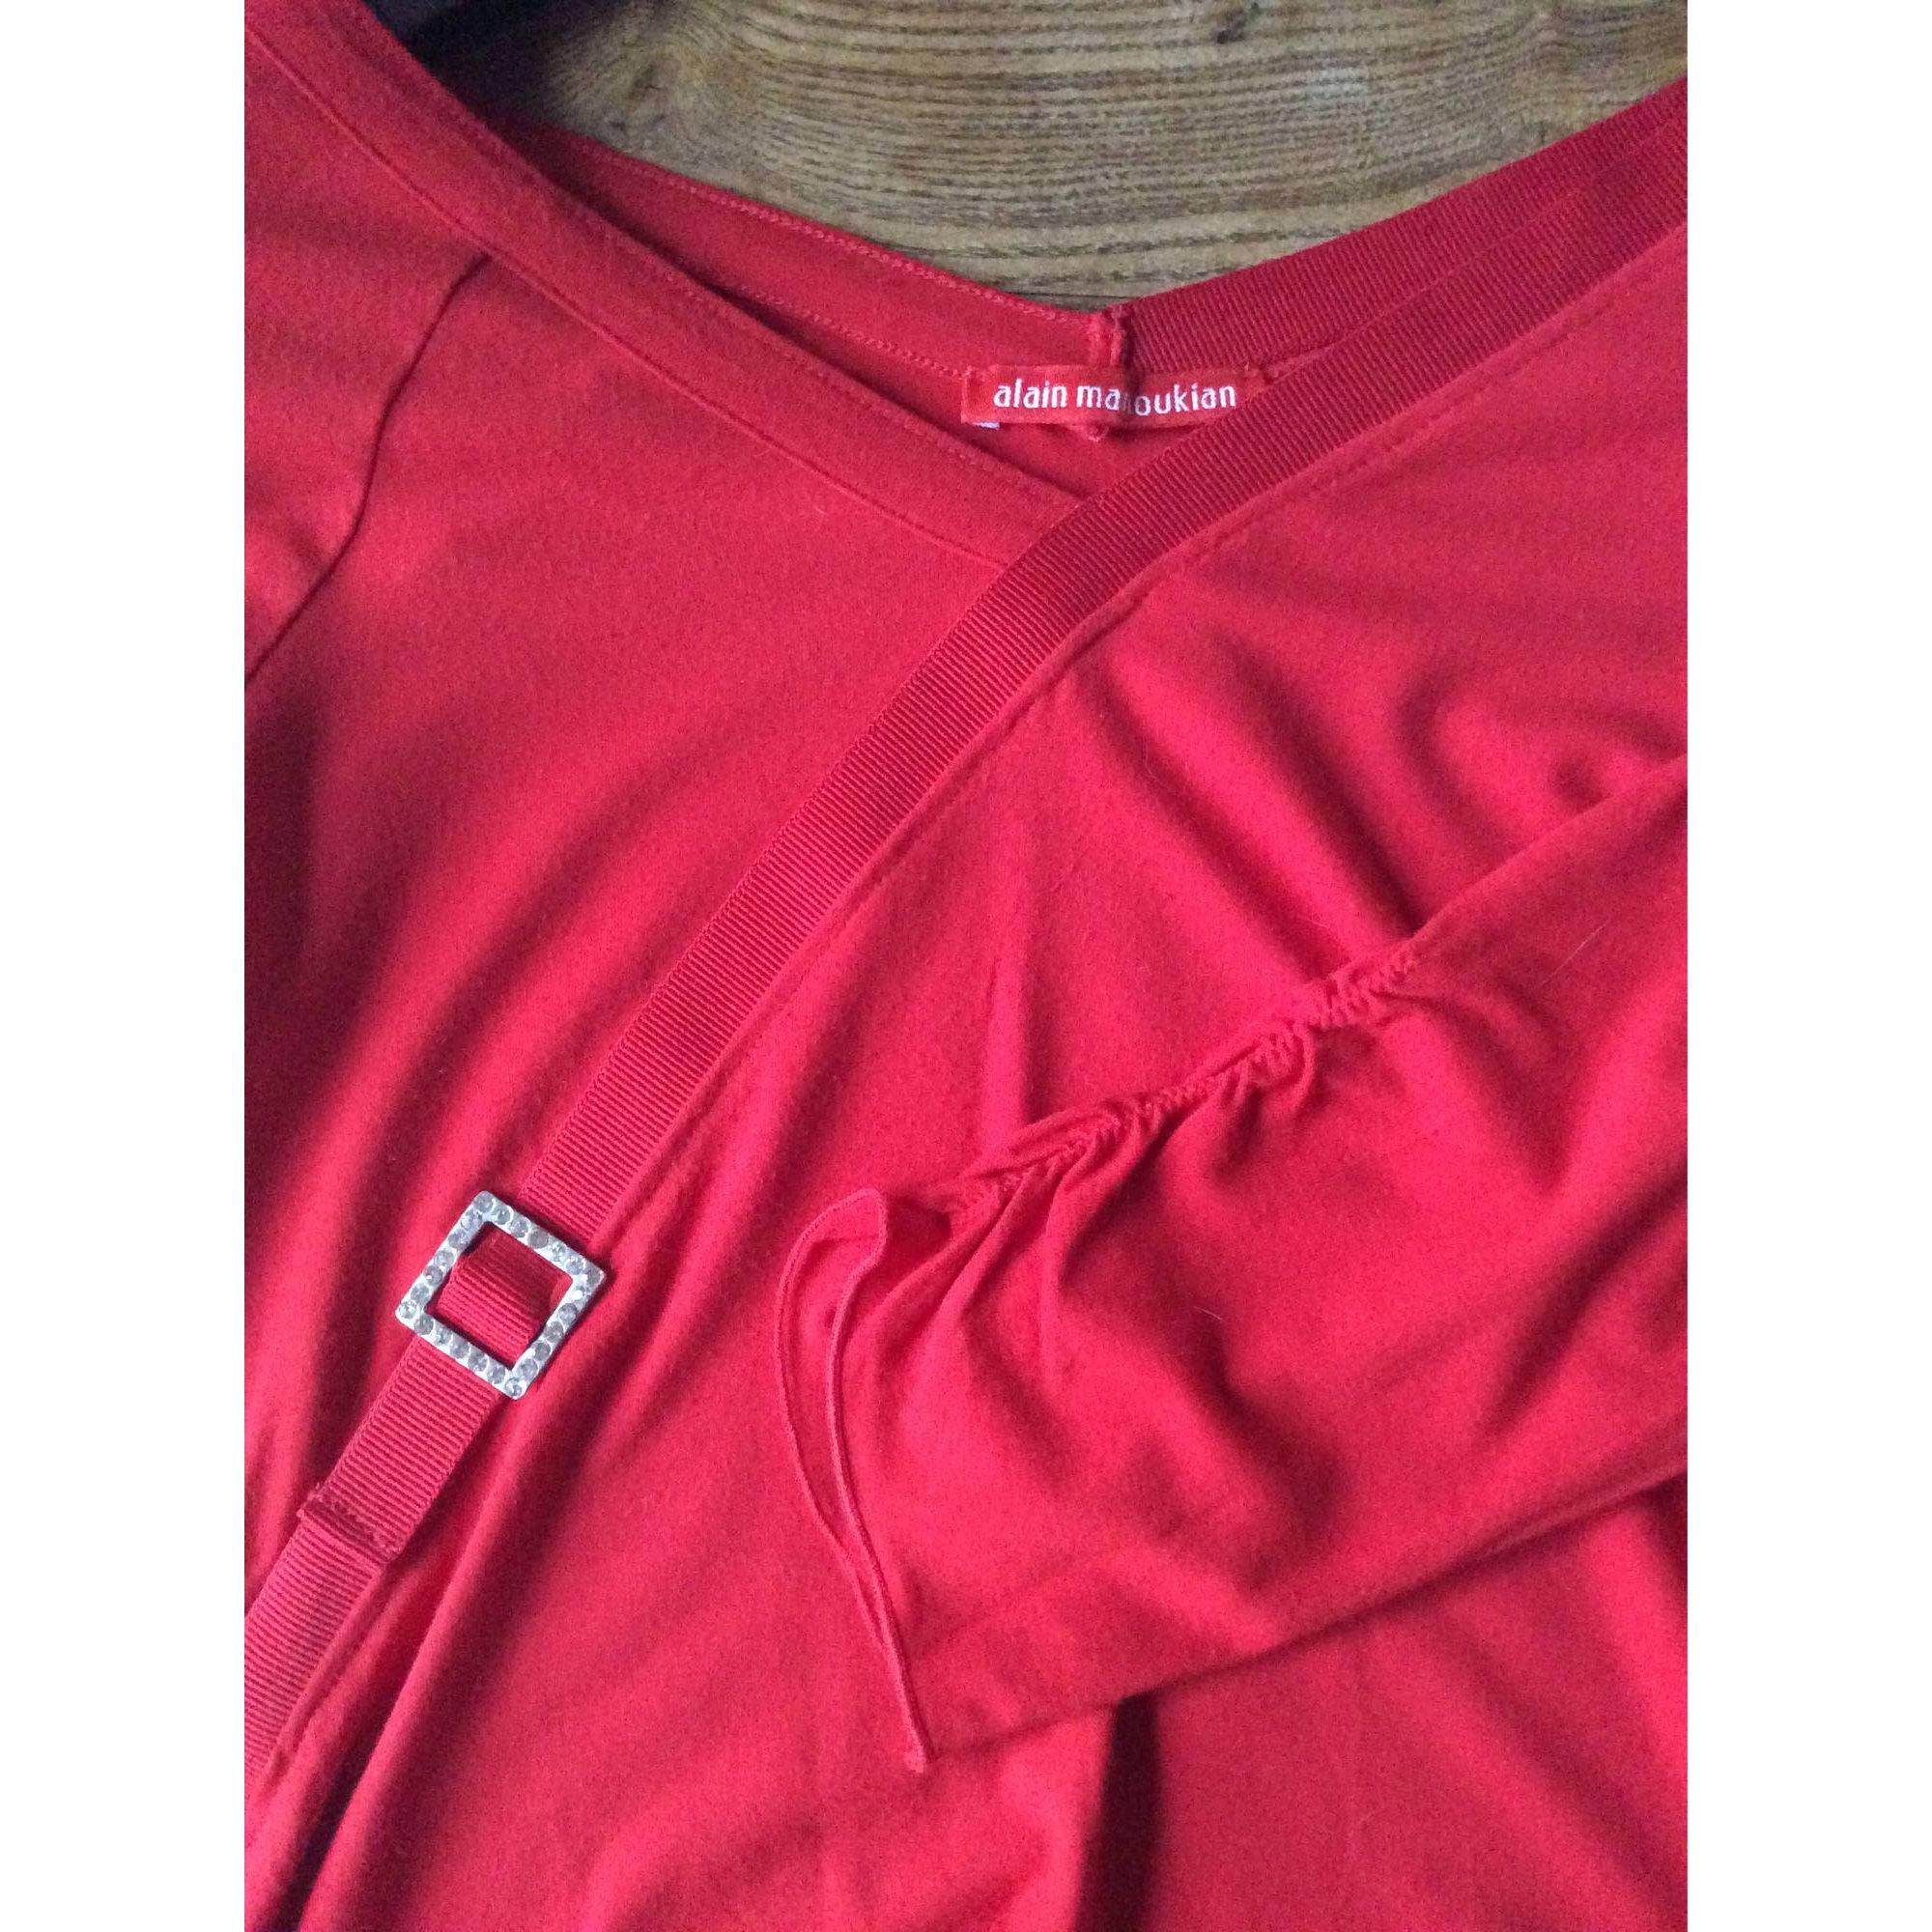 Top, tee-shirt ALAIN MANOUKIAN Rouge, bordeaux